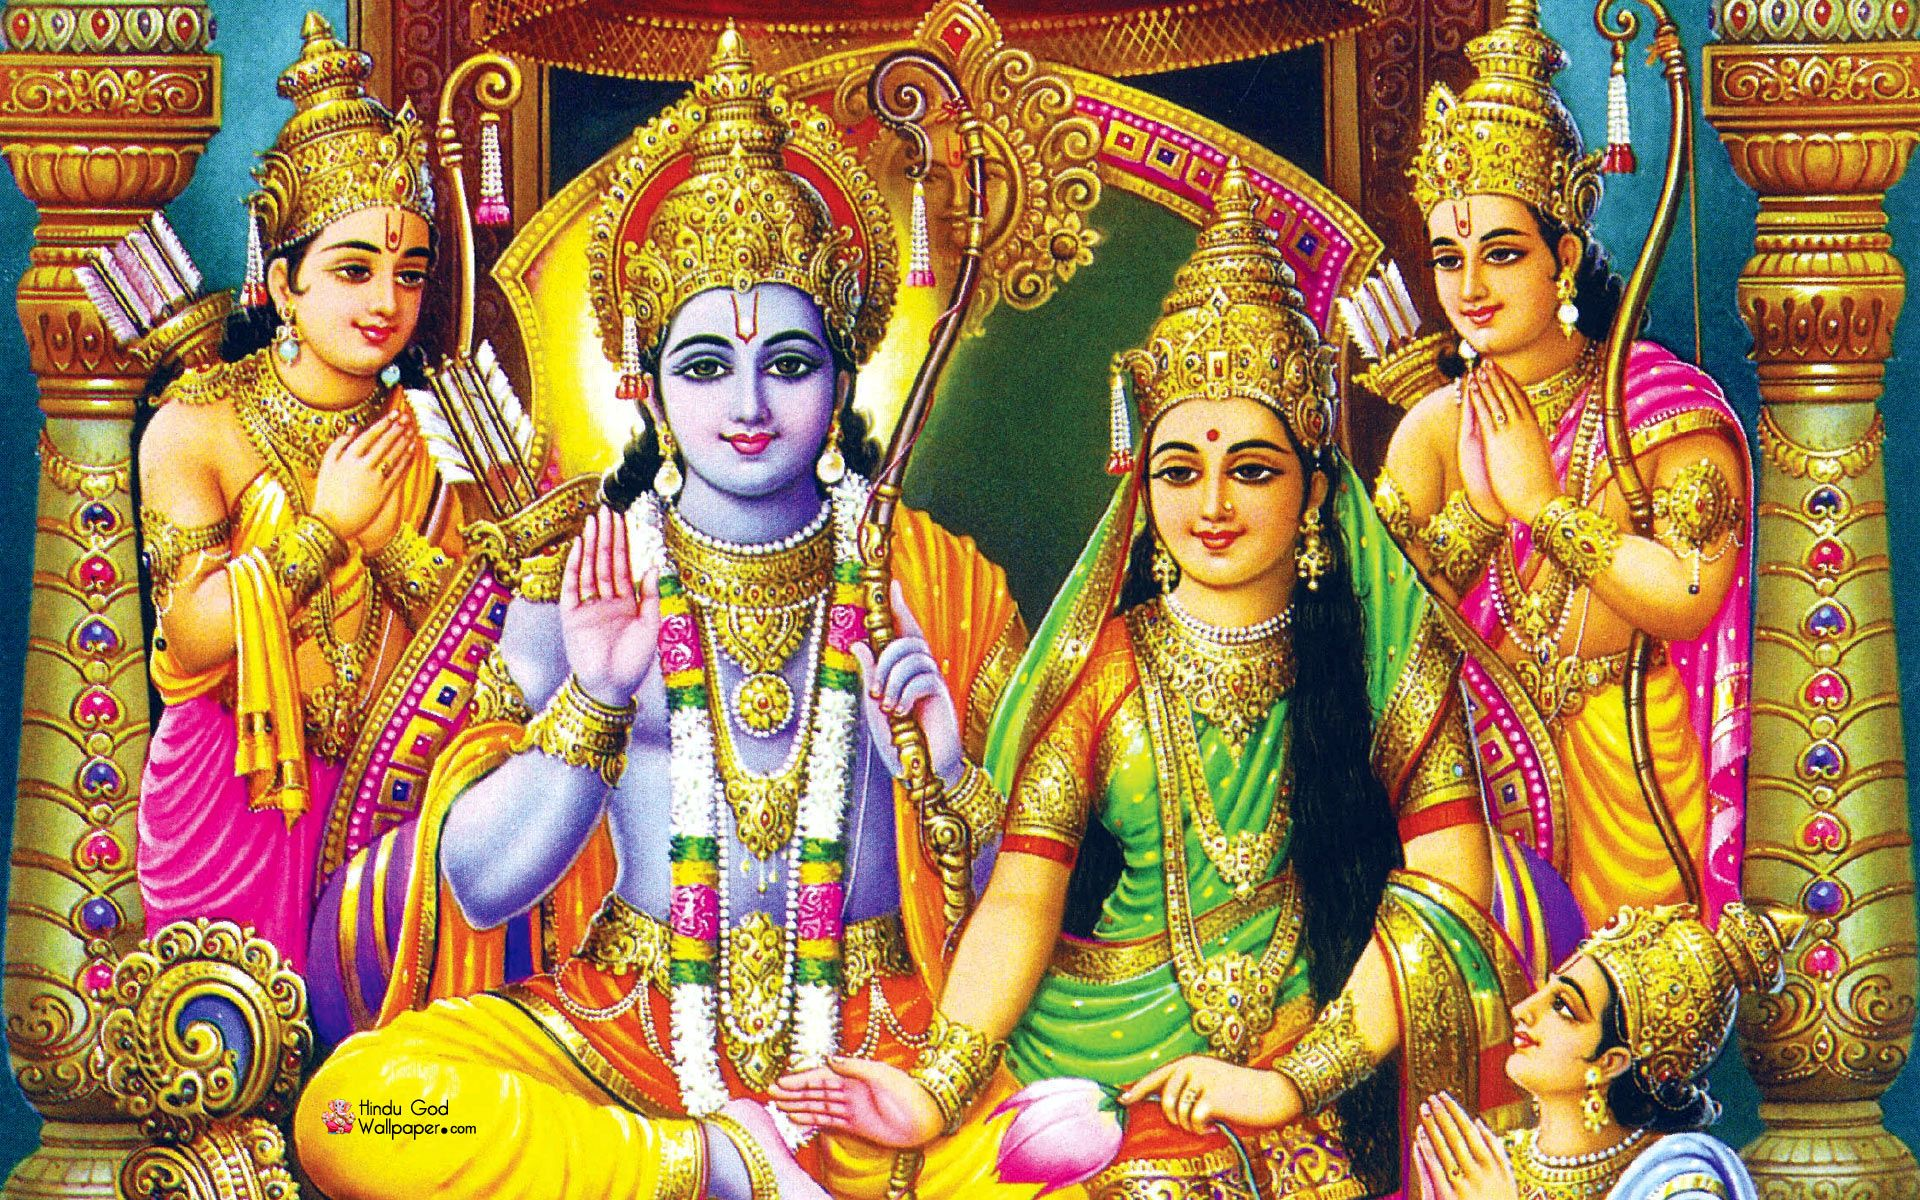 PunjabKesari, Sri ram charit manas, श्री रामचरित मानस